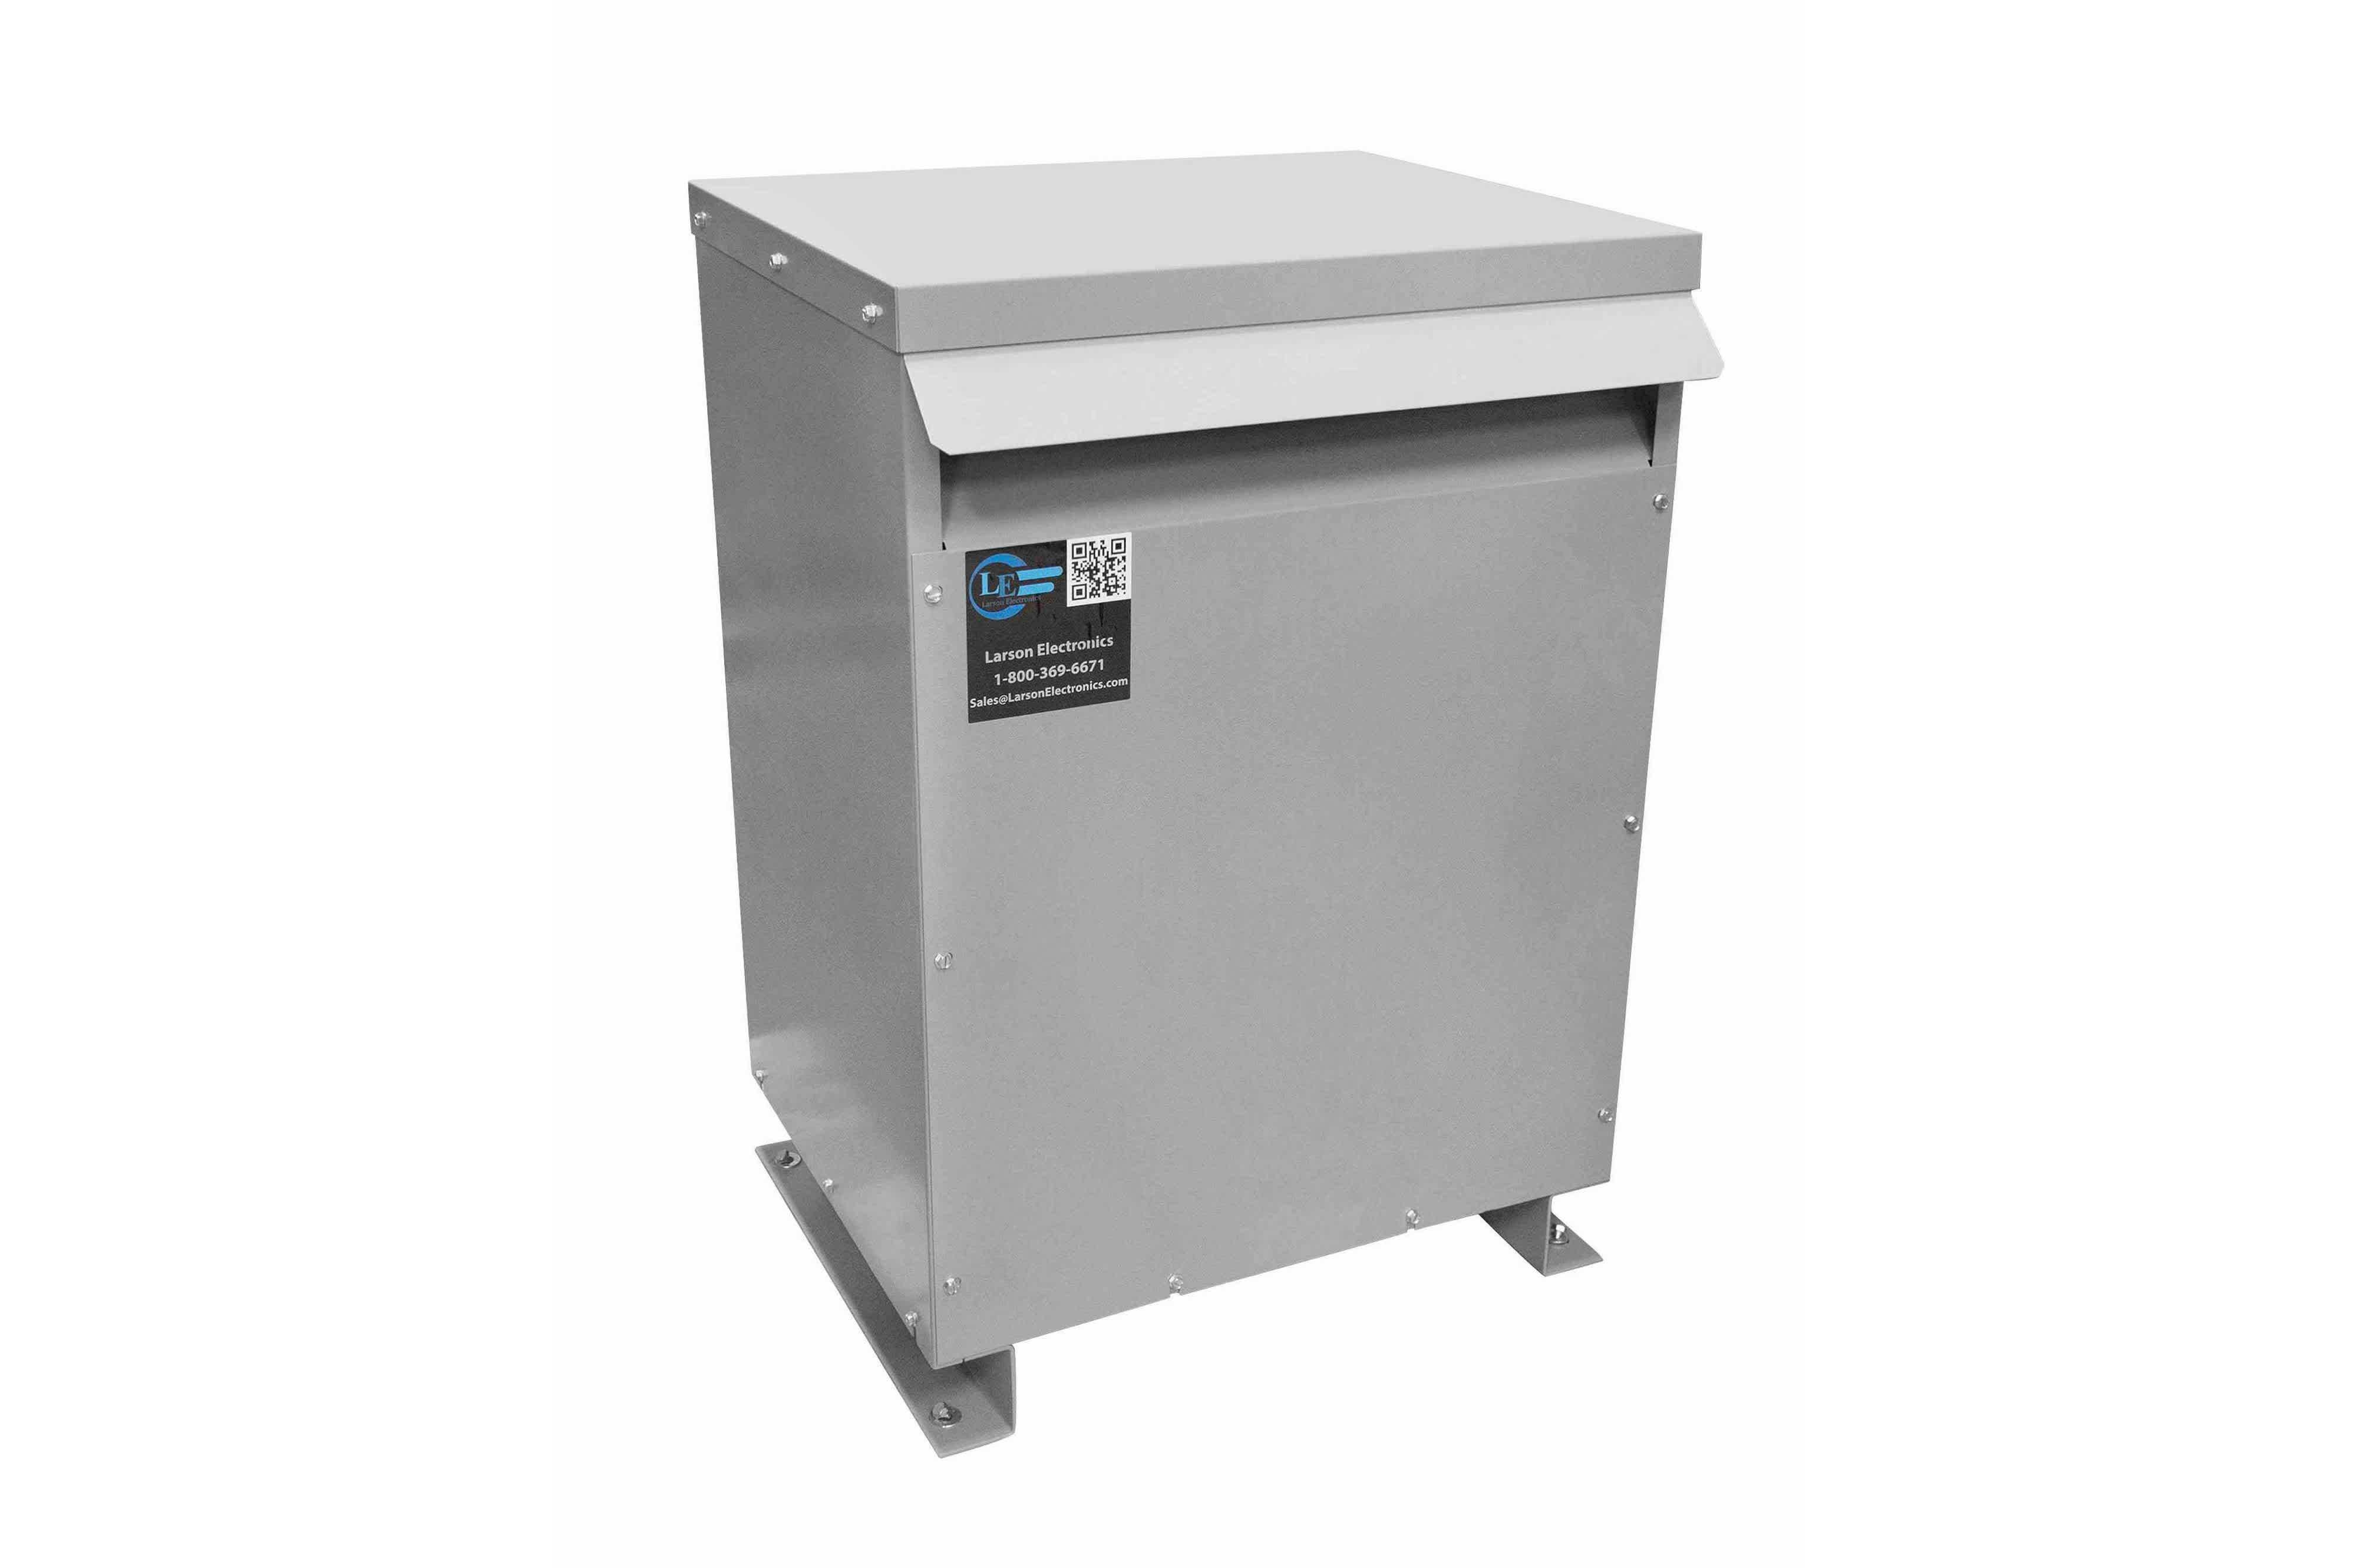 36 kVA 3PH Isolation Transformer, 440V Wye Primary, 240V Delta Secondary, N3R, Ventilated, 60 Hz